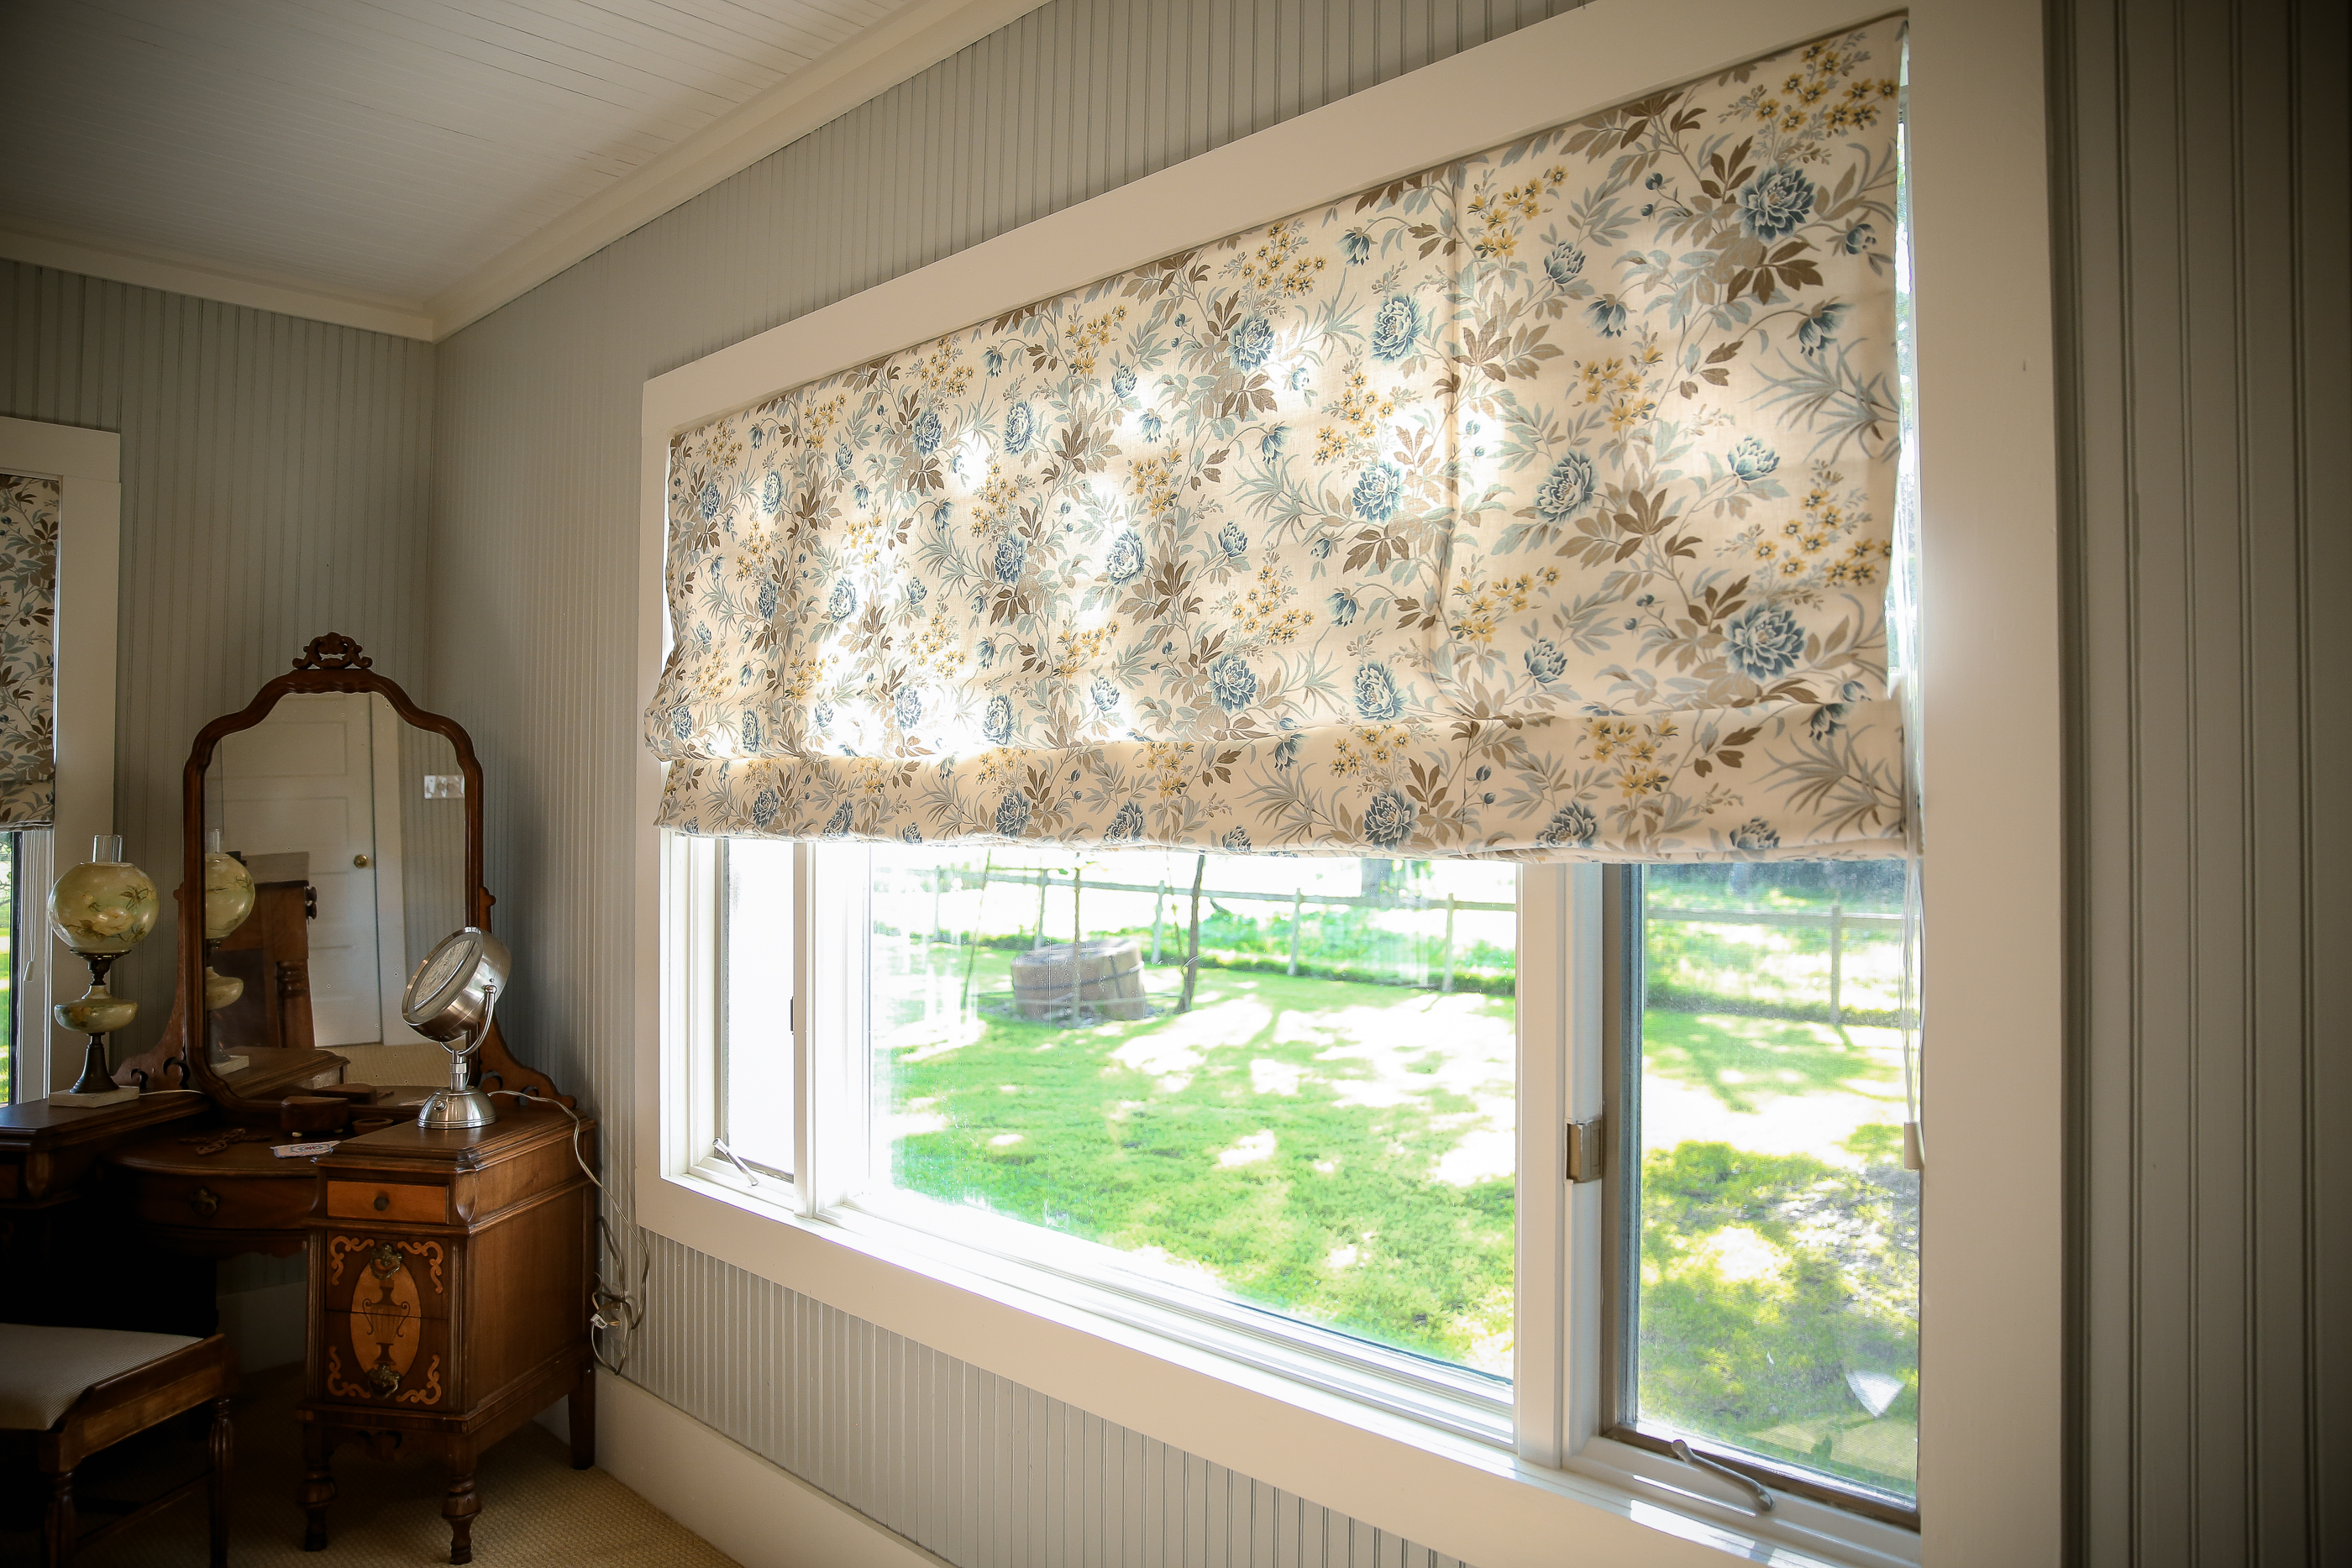 Custom Window Treatment in Bedroom